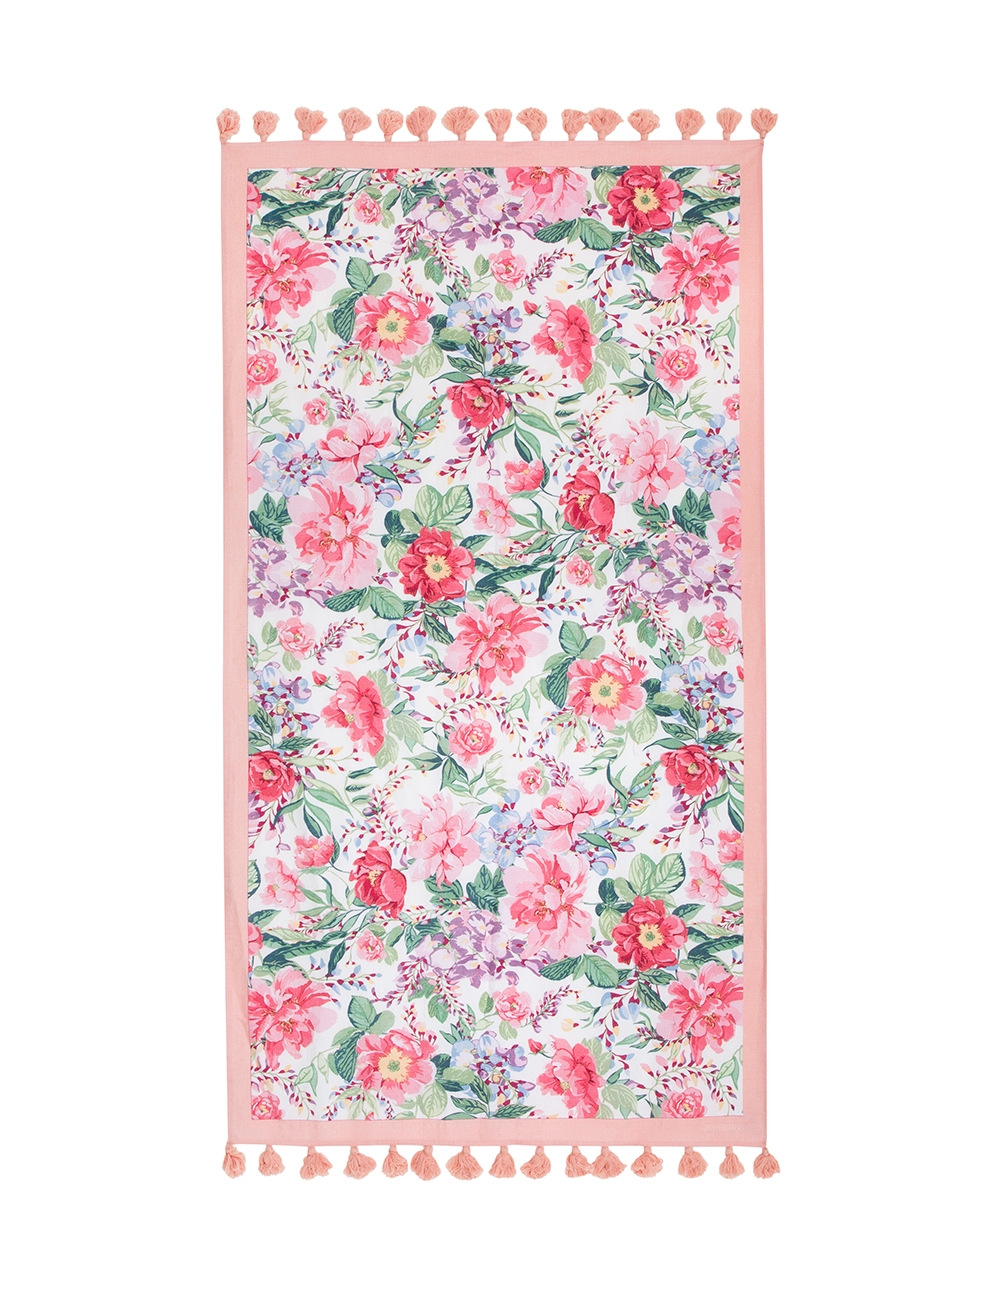 Printed Woven Towel